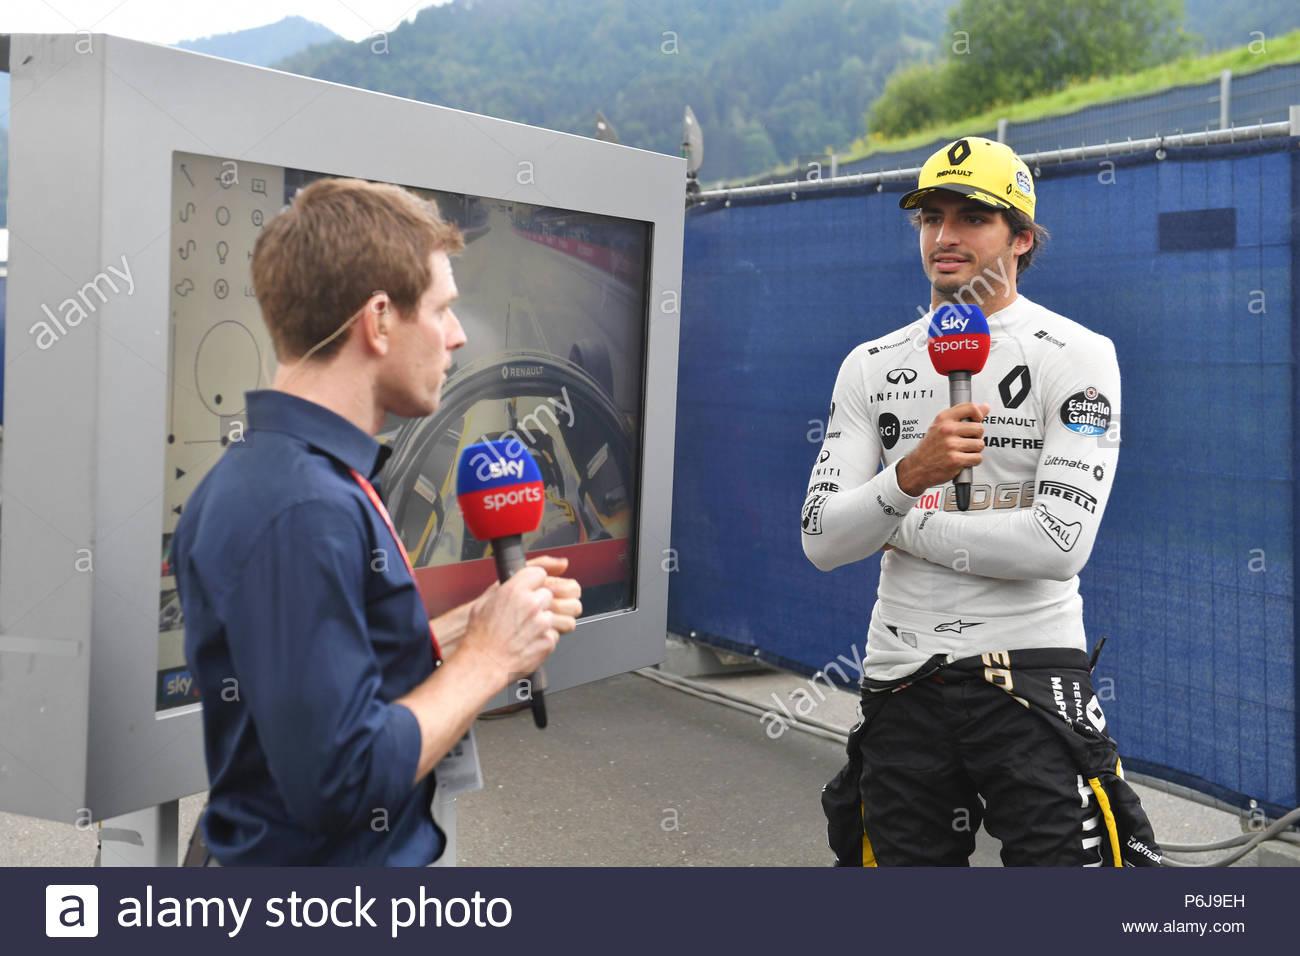 RED BULL RING, AUSTRIA - JUNE 30: Anthony Davidson (GBR) Sky TV